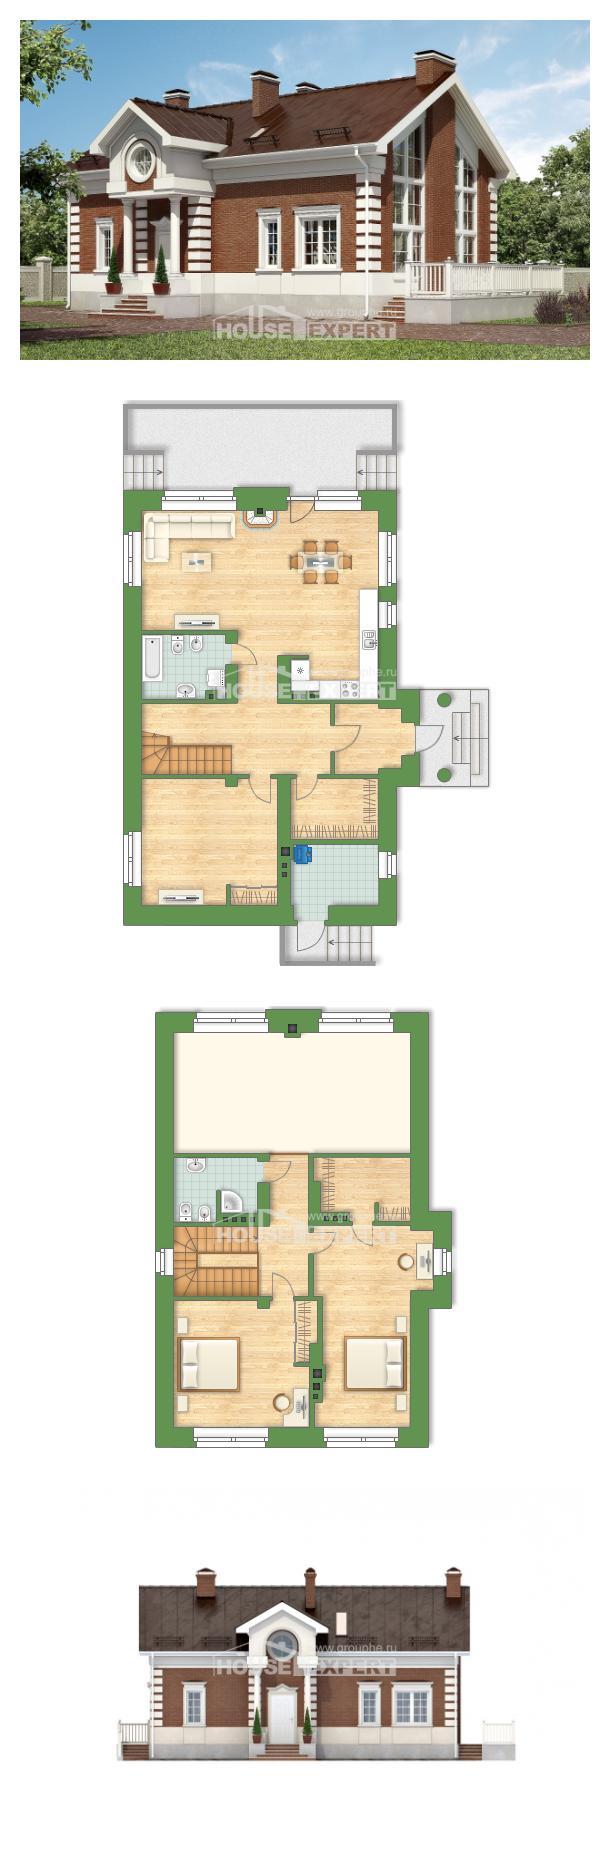 Projekt domu 160-009-R   House Expert